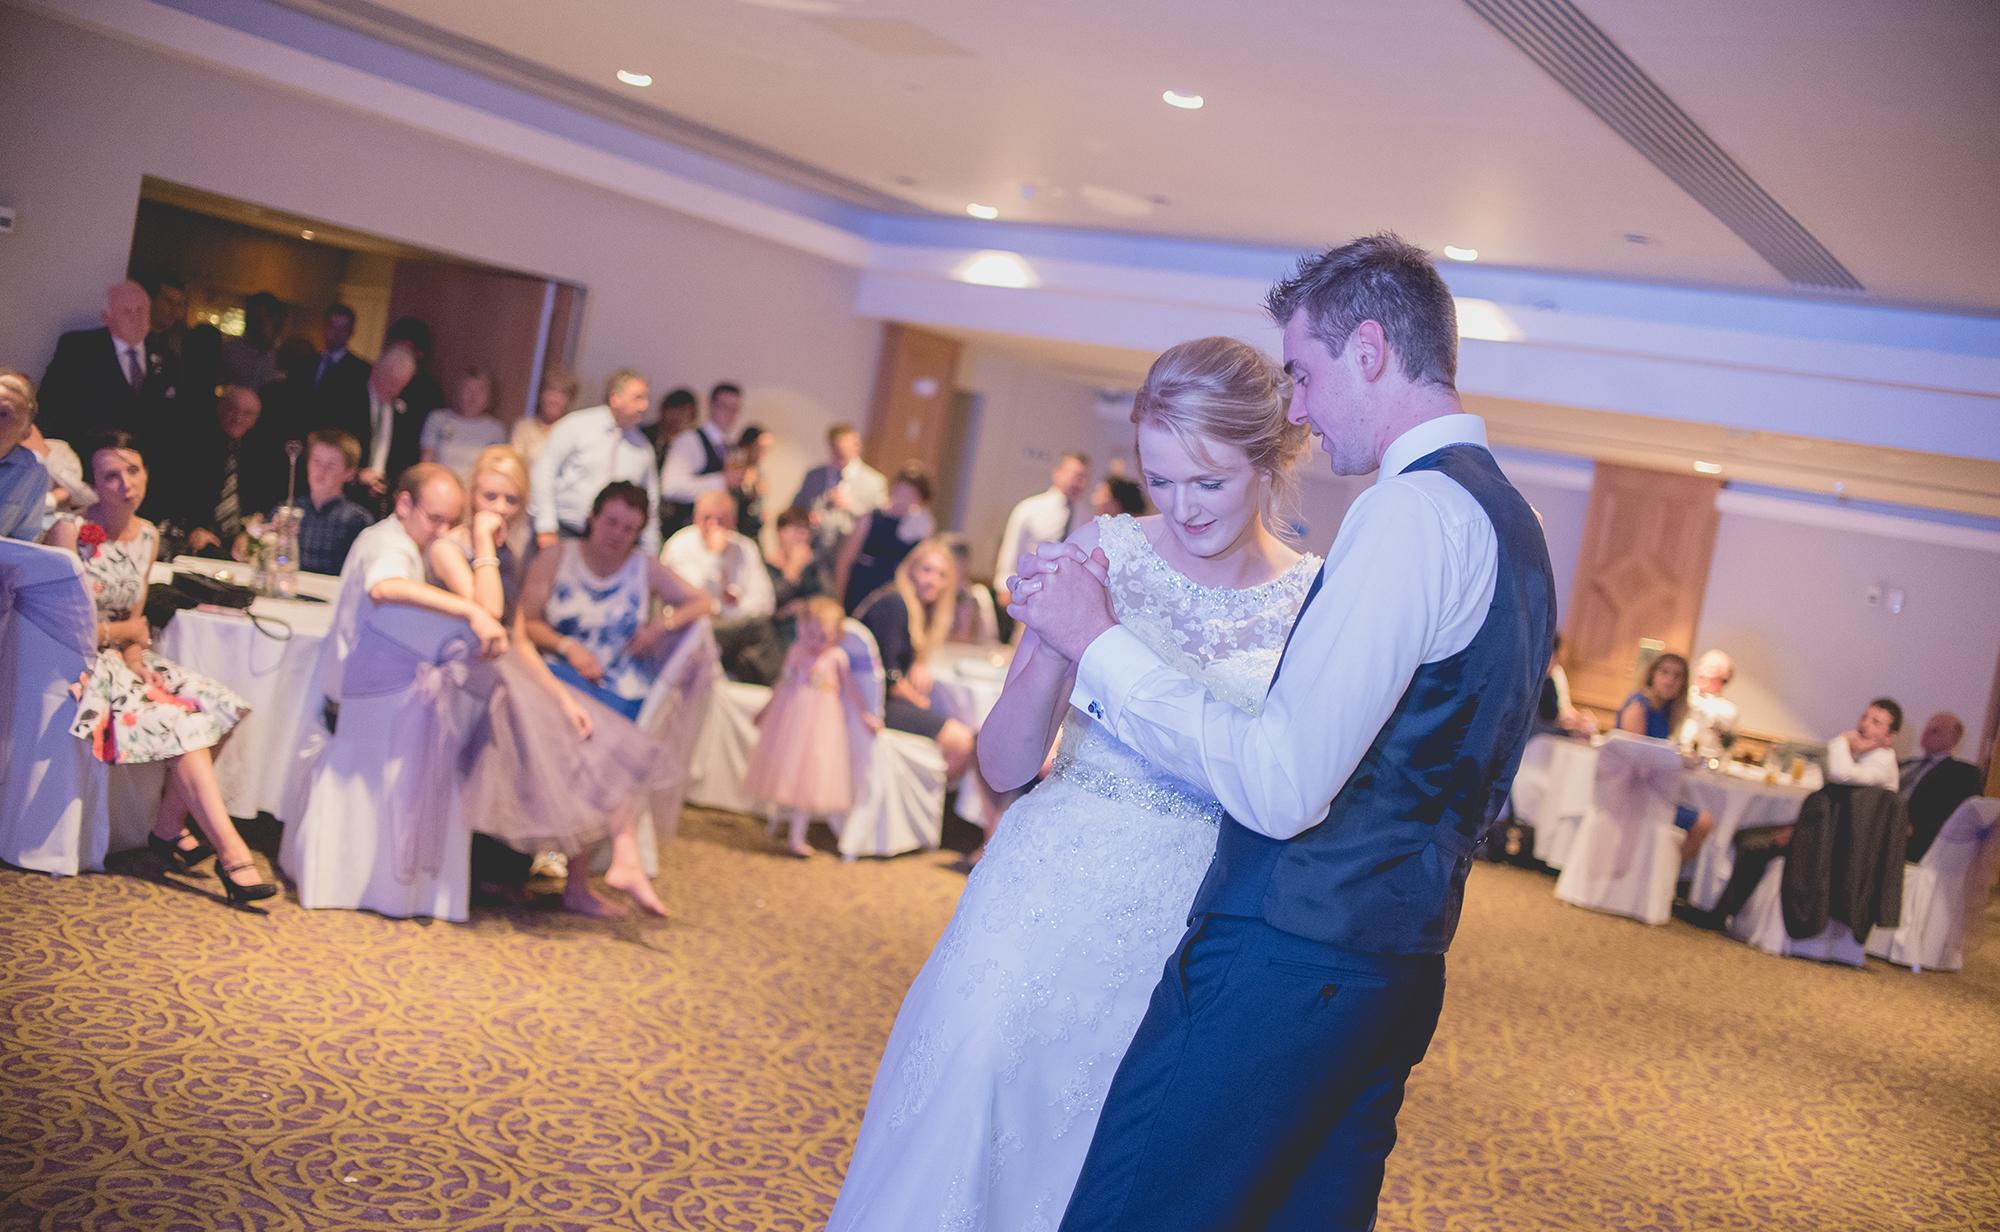 ballygally wedding photography tc photography larne belfast lisburn10